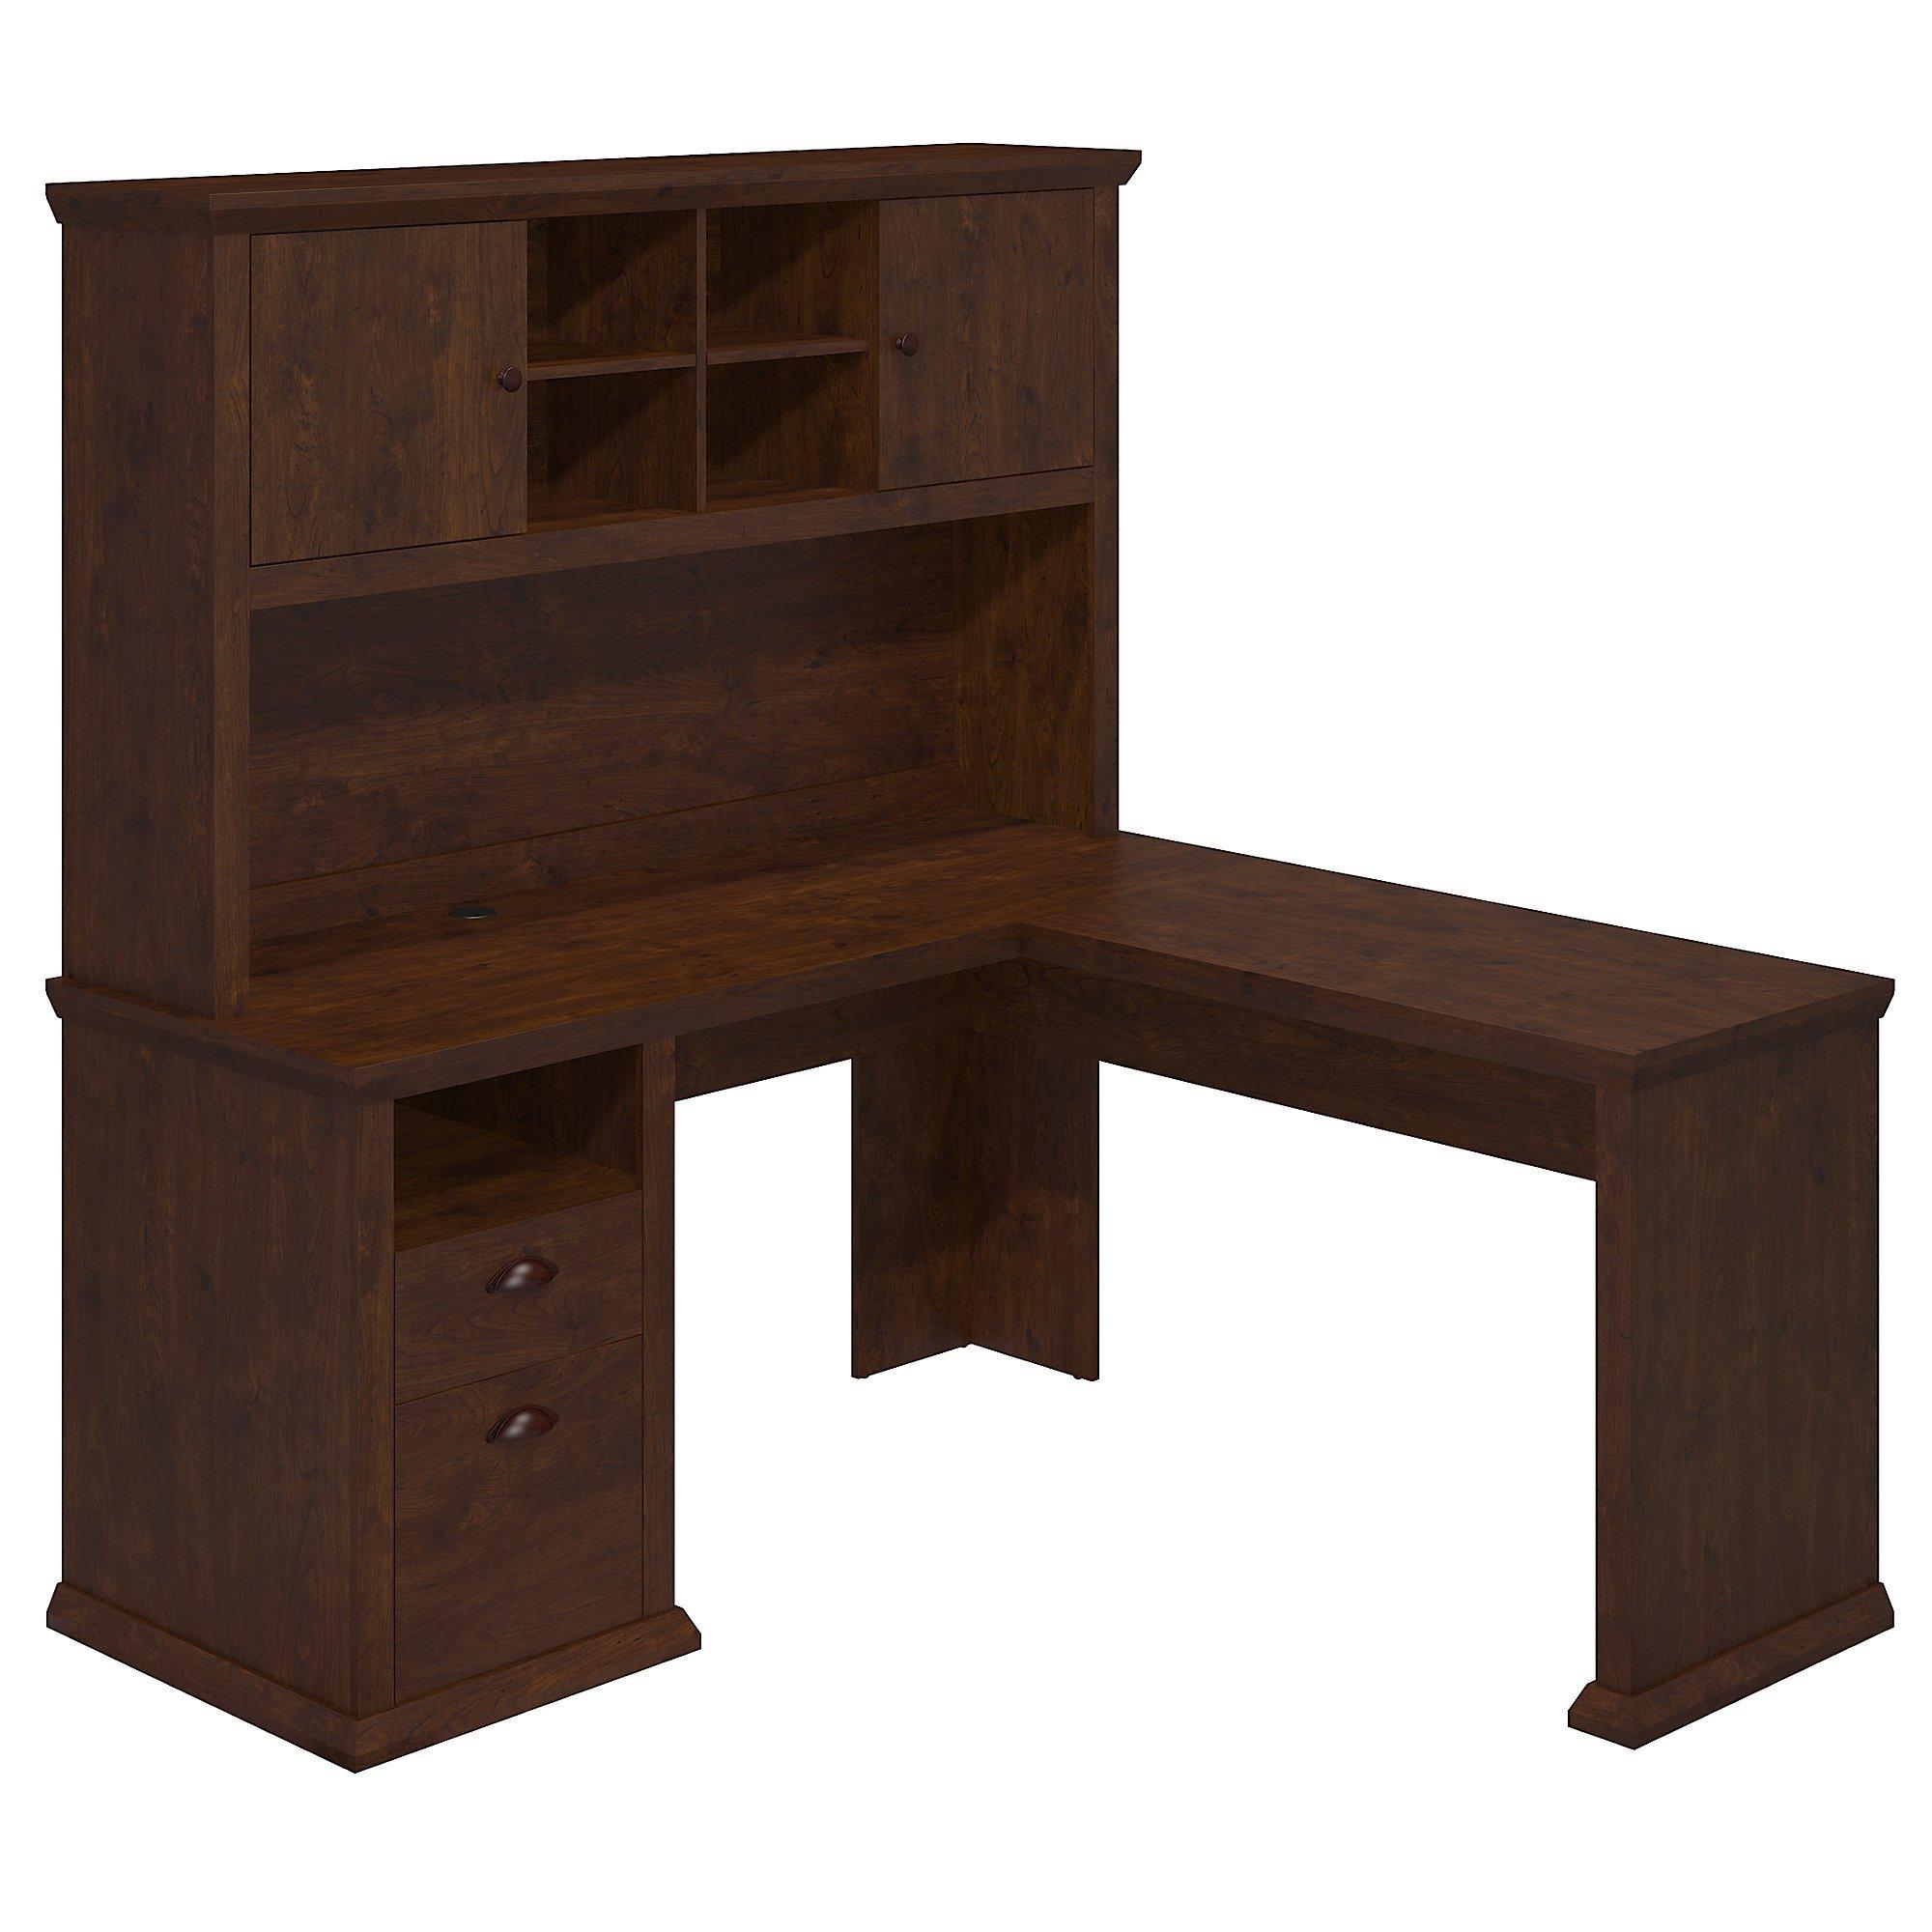 Bush Furniture Yorktown L Shaped Desk with Hutch in Antique Cherry